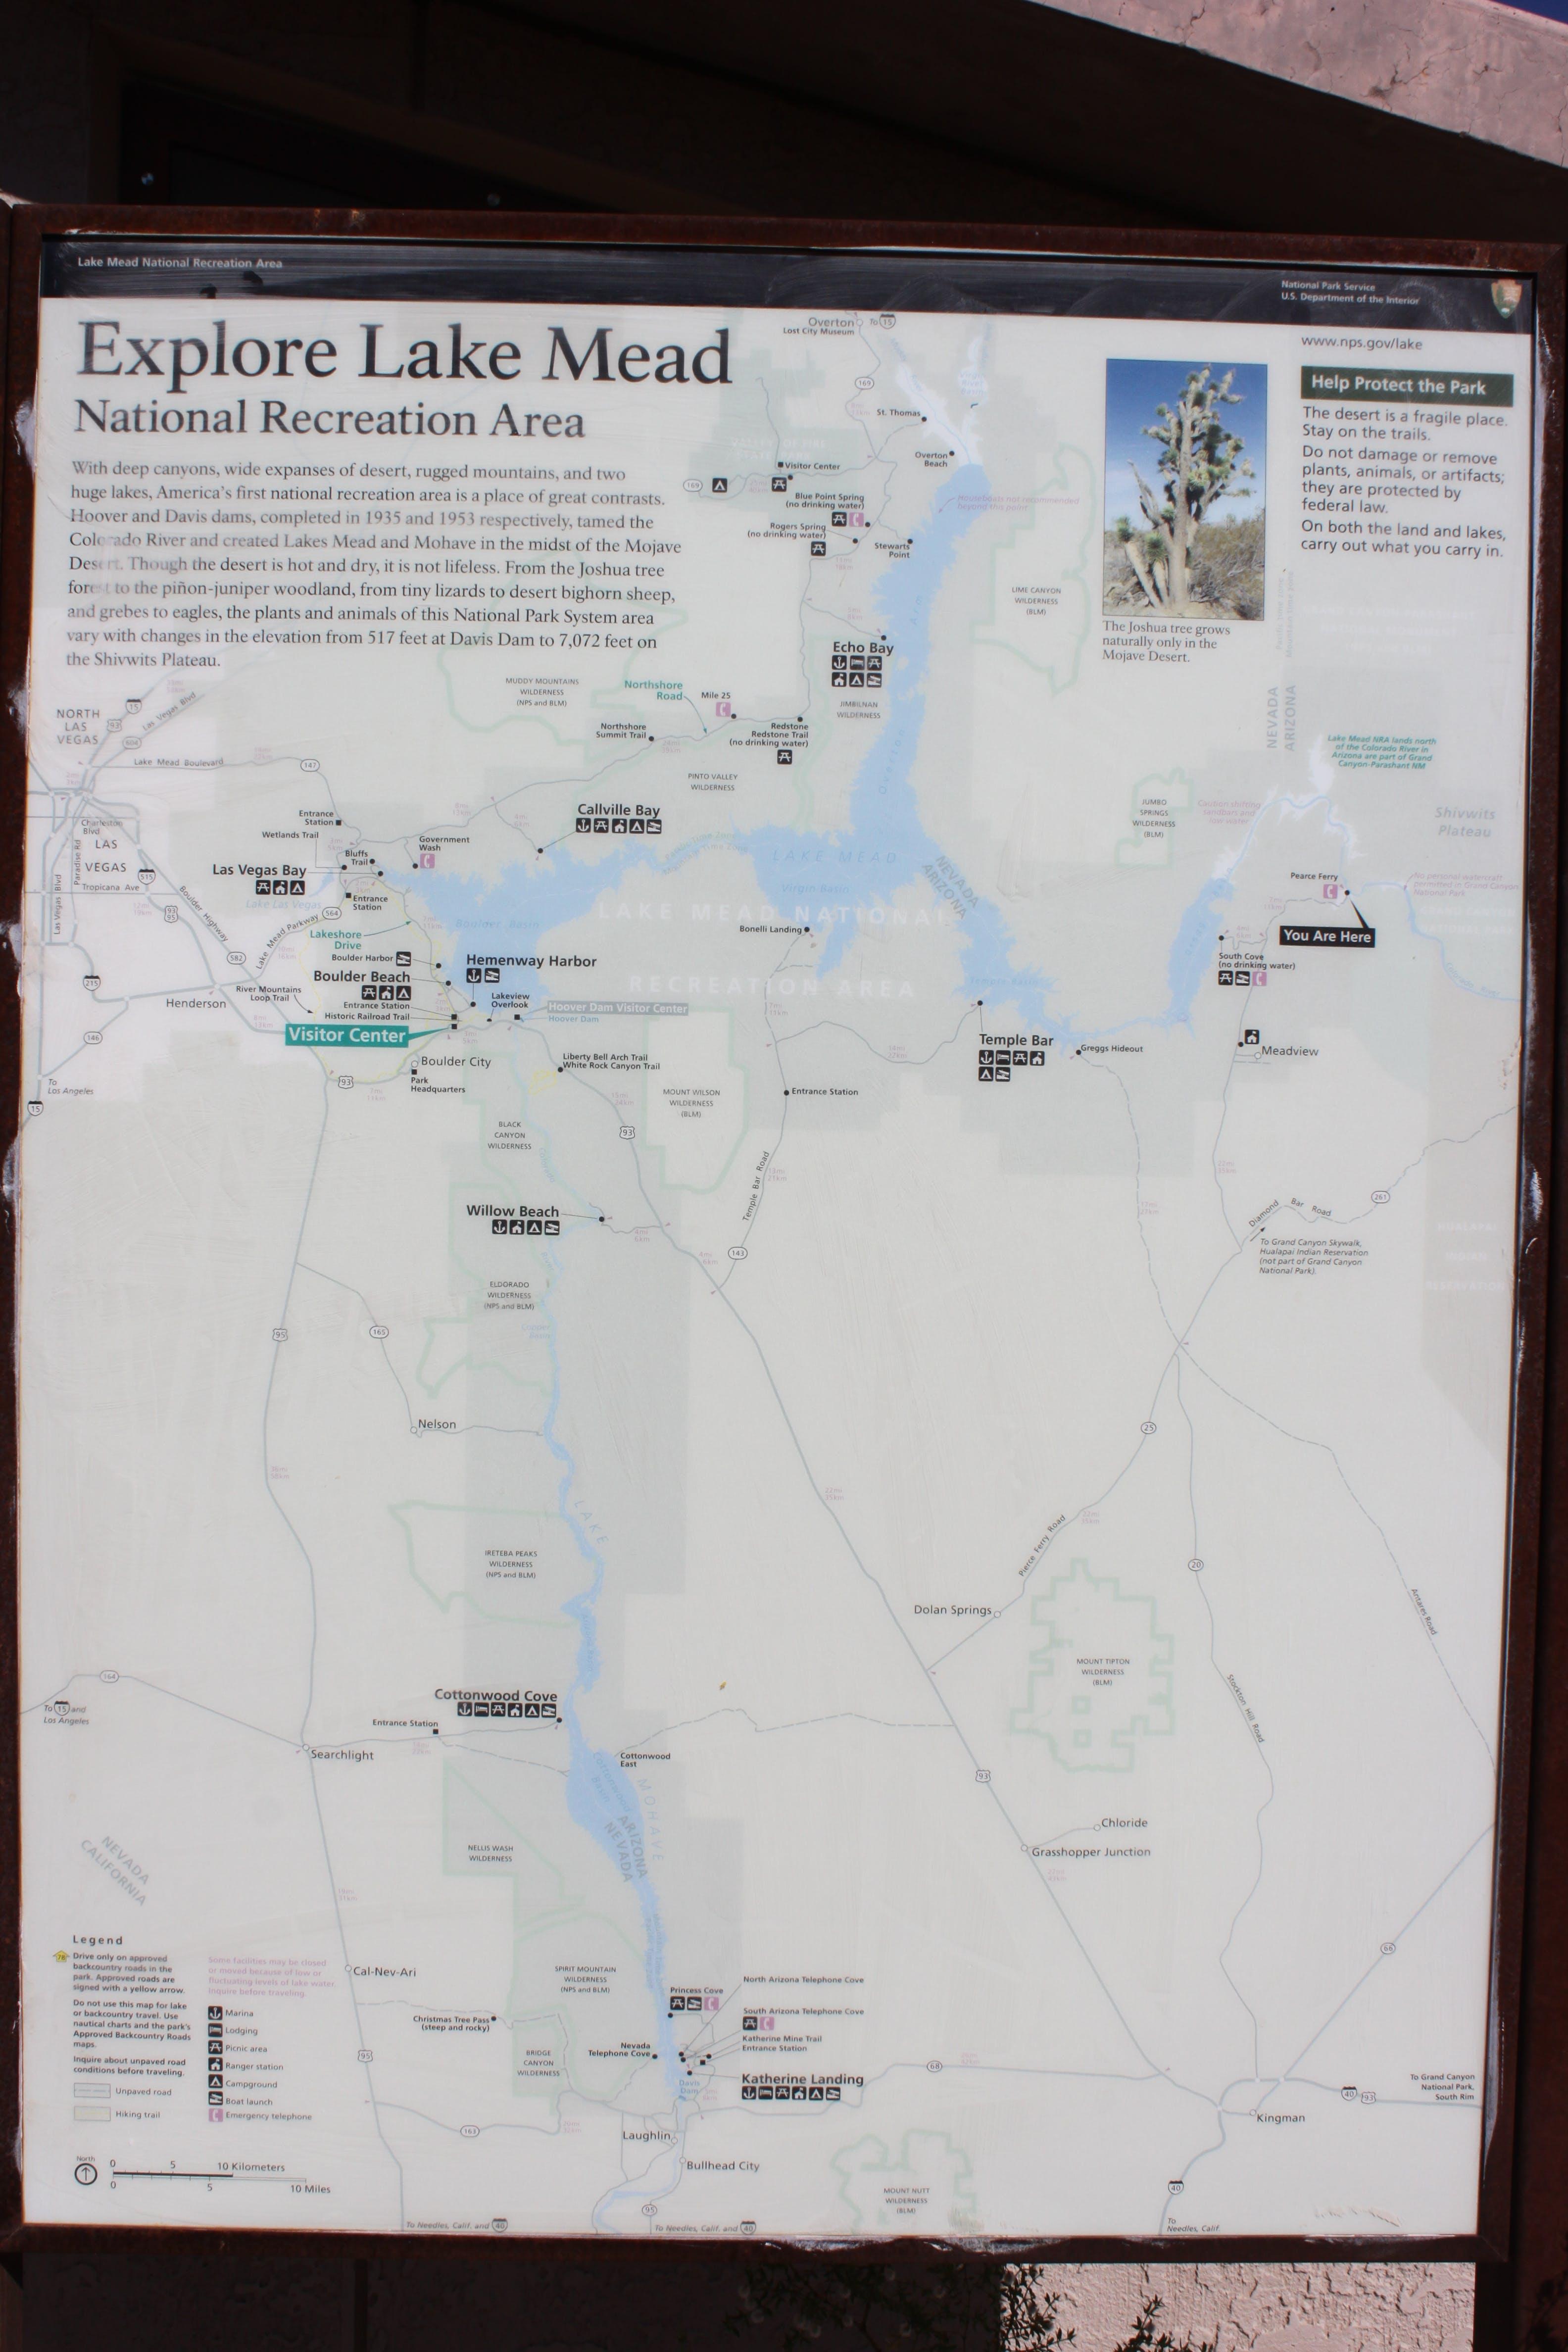 Pearce Arizona Map.Pearce Ferry Campground Az Daniel L Reviews Pearce Ferry